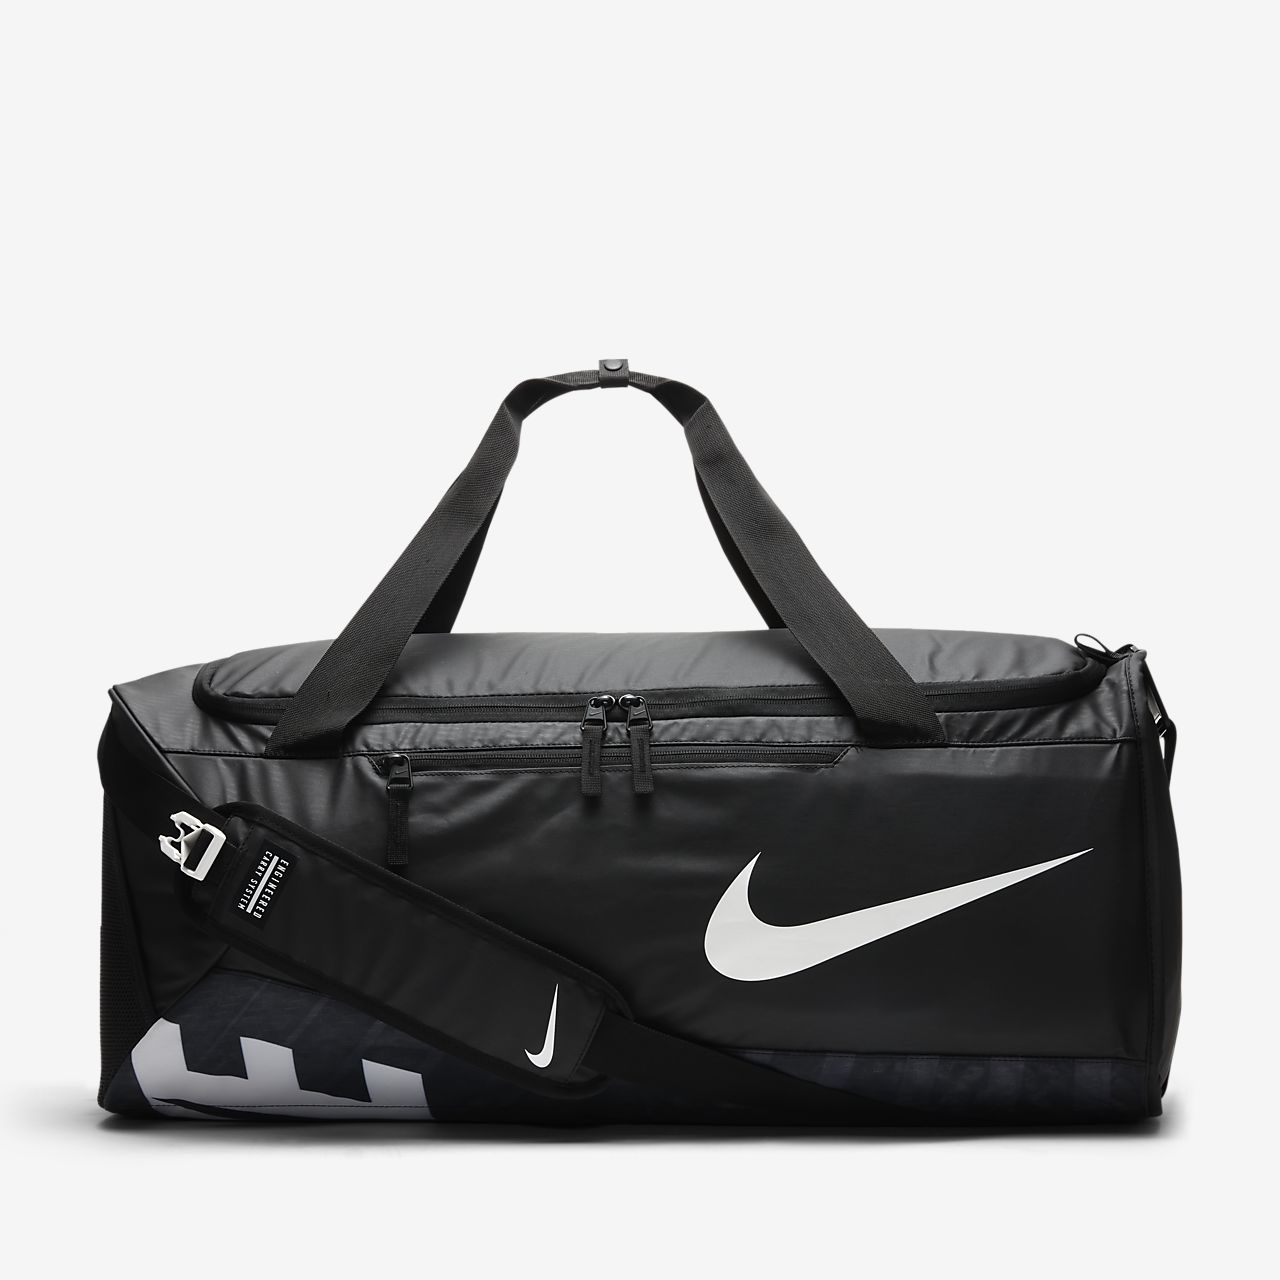 c78e4a8d26 Borsone grande Nike Alpha Adapt Cross Body. Nike.com IT